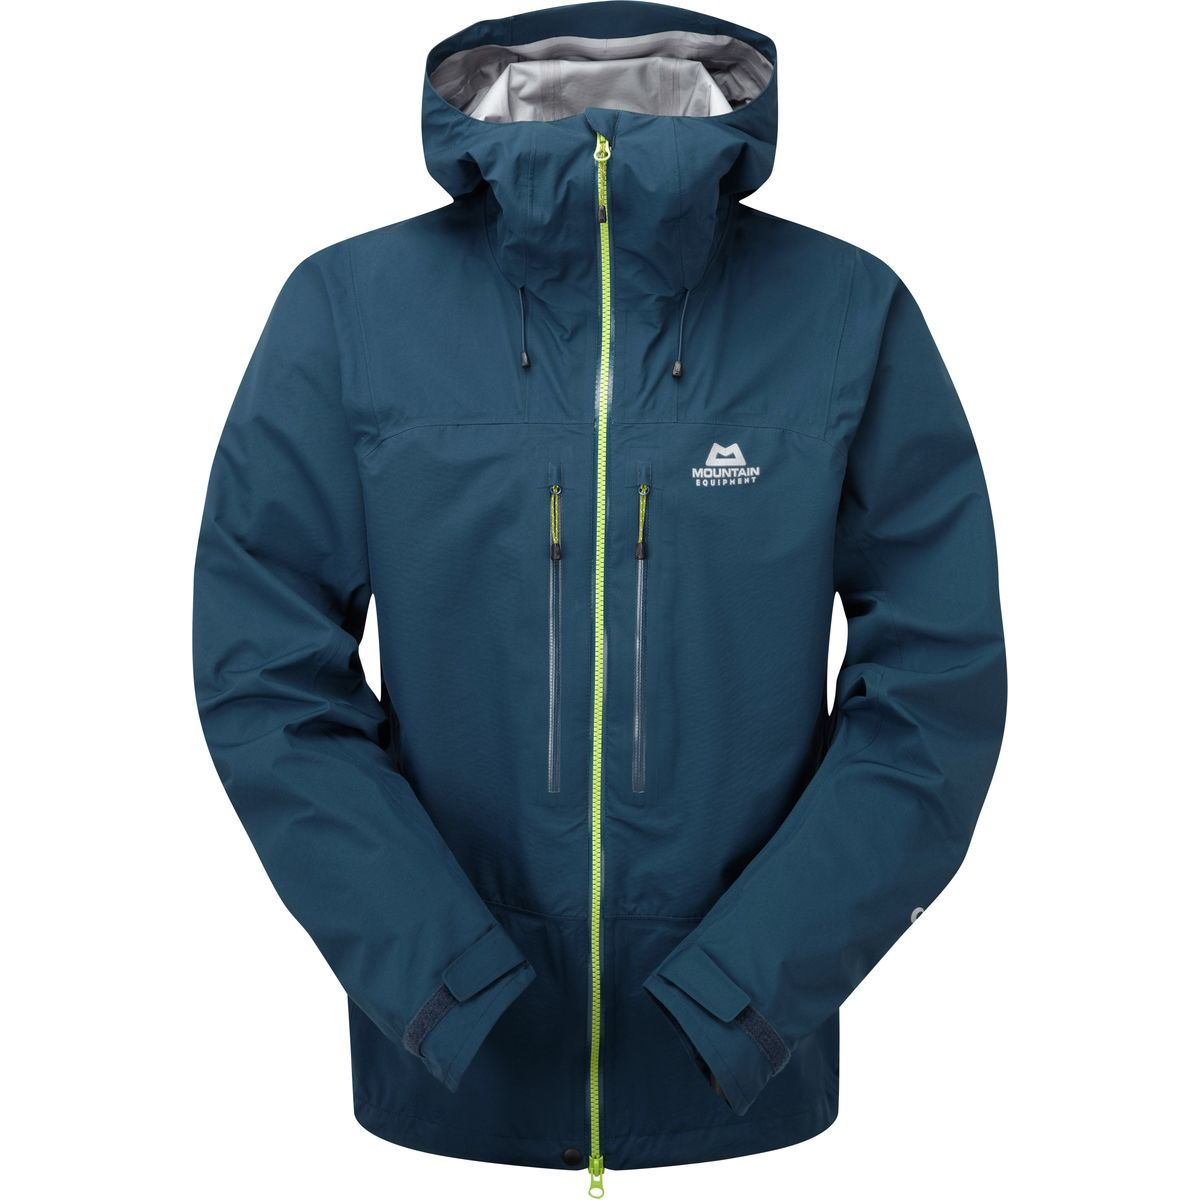 Mountain Equipment Narwhal Jacket - Men